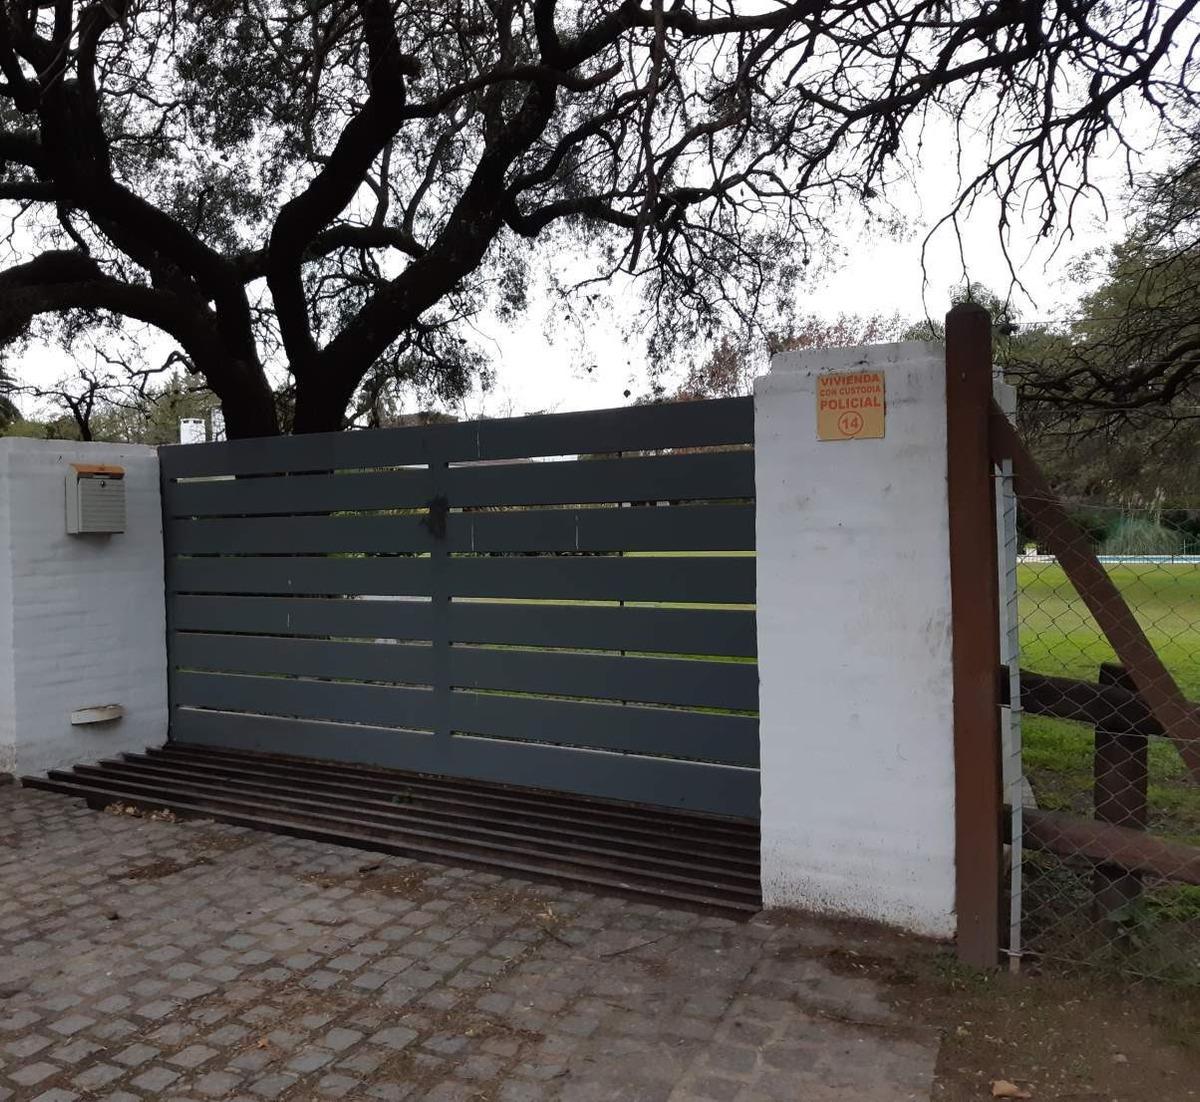 alquiler temporal chalet esquina villa allende golf -3 dormitorios (frente al club de golf)